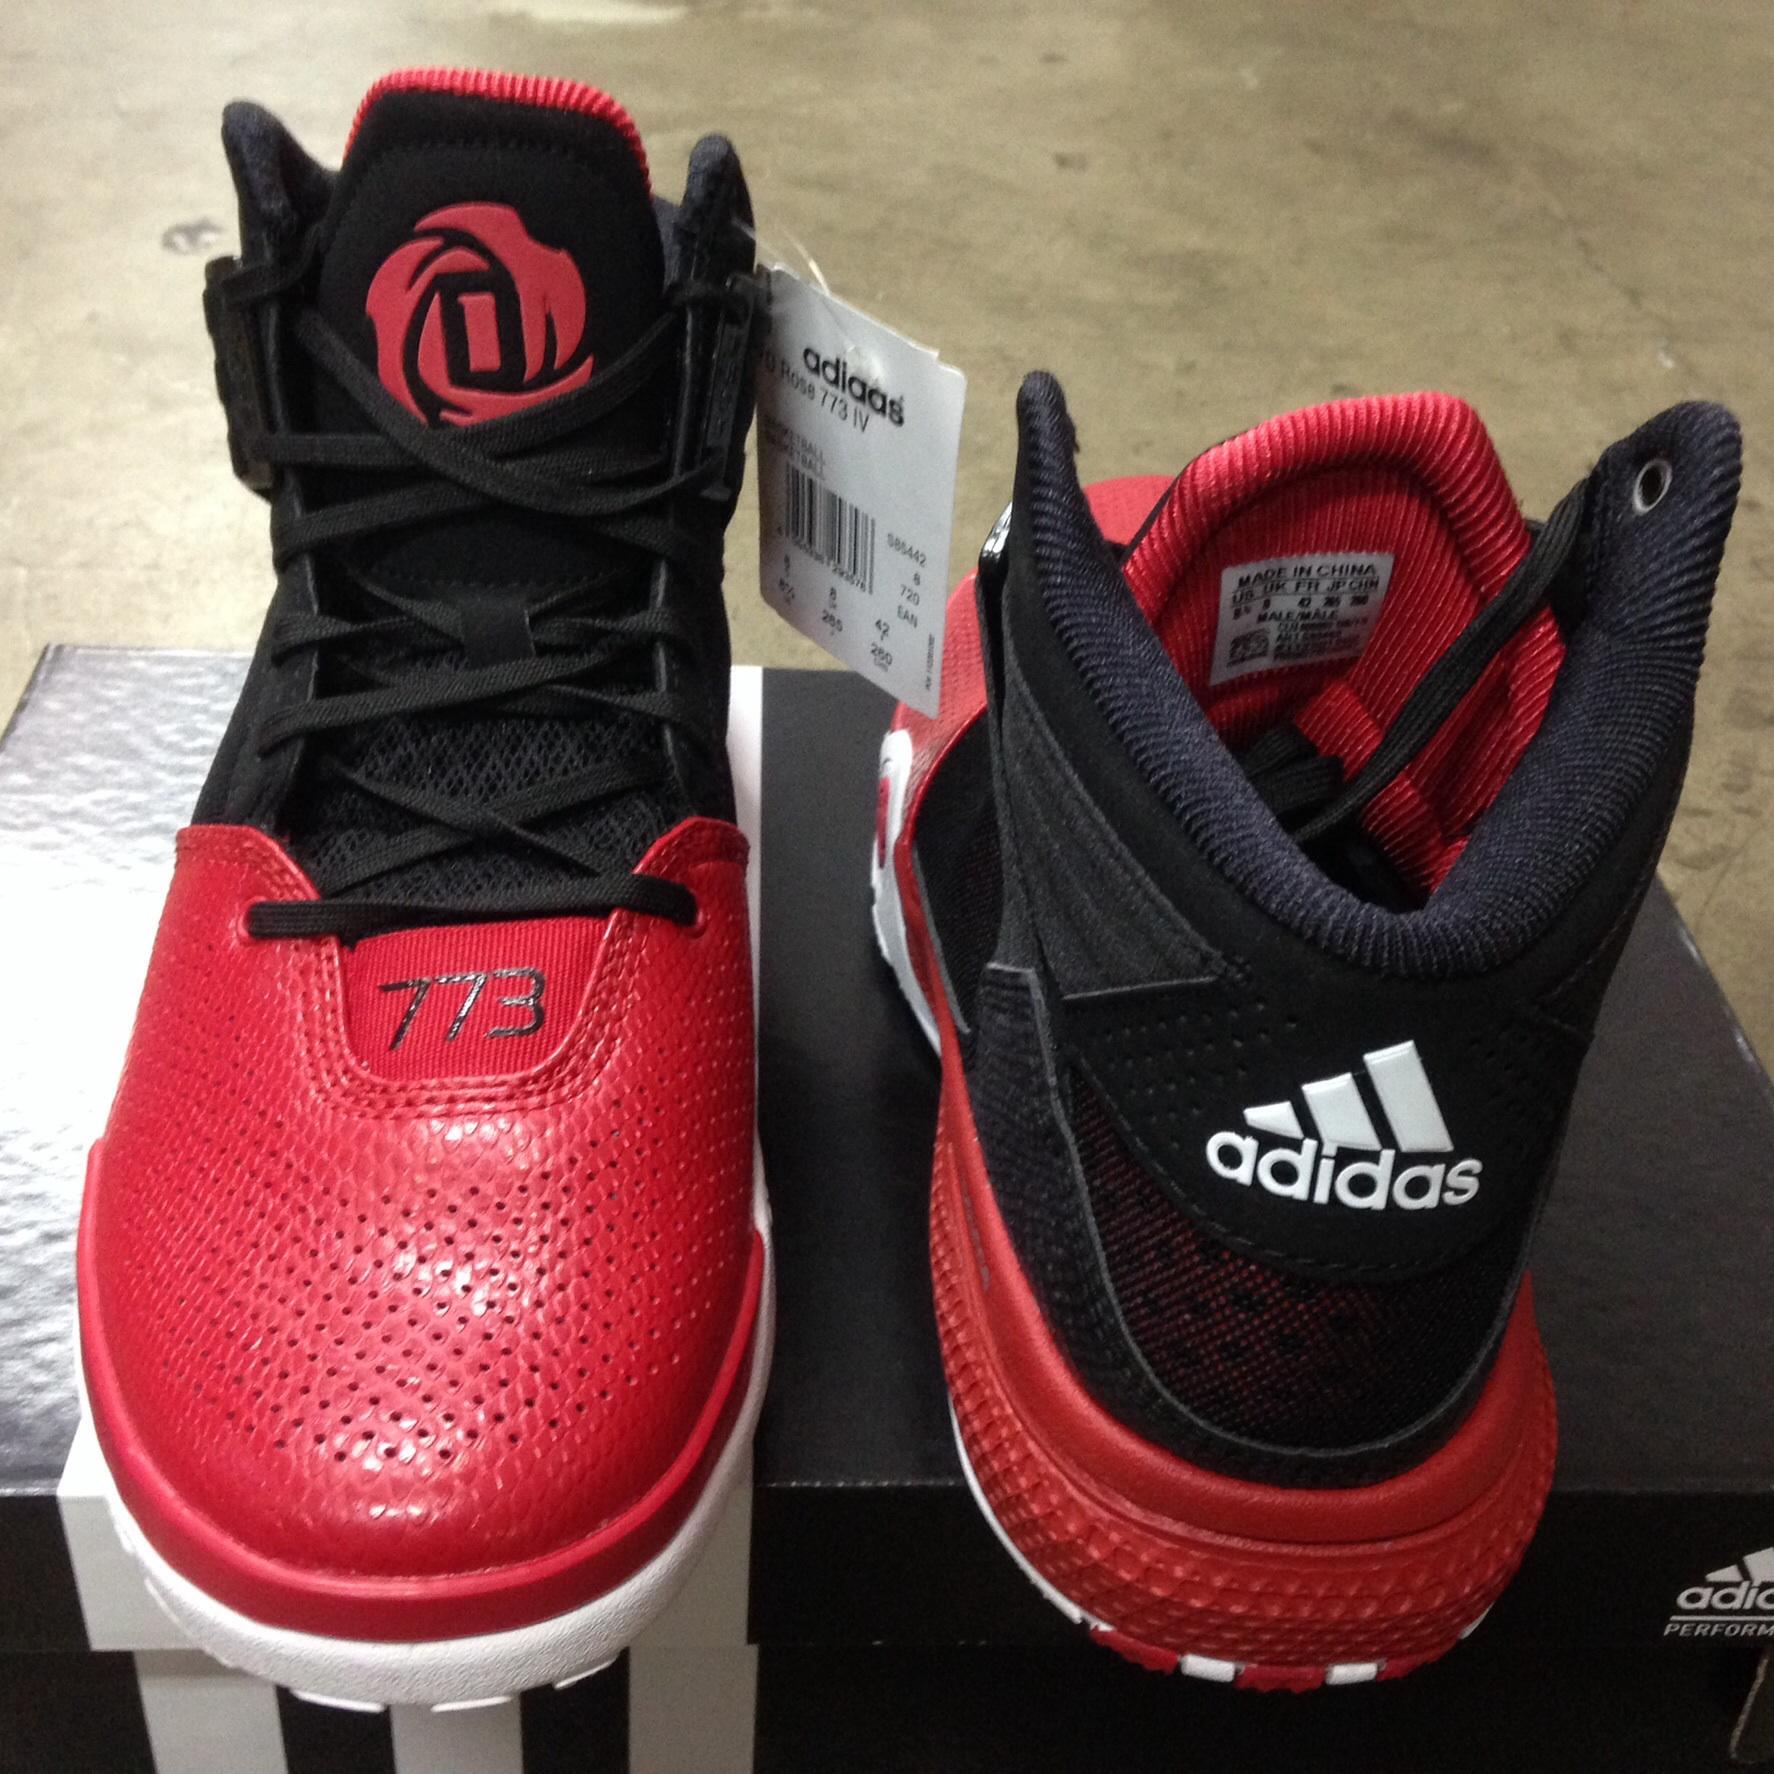 new concept 1d529 e6069 ... usa spatu basket adidas d rose 773 iv black red size 47 1 3. cc1b0